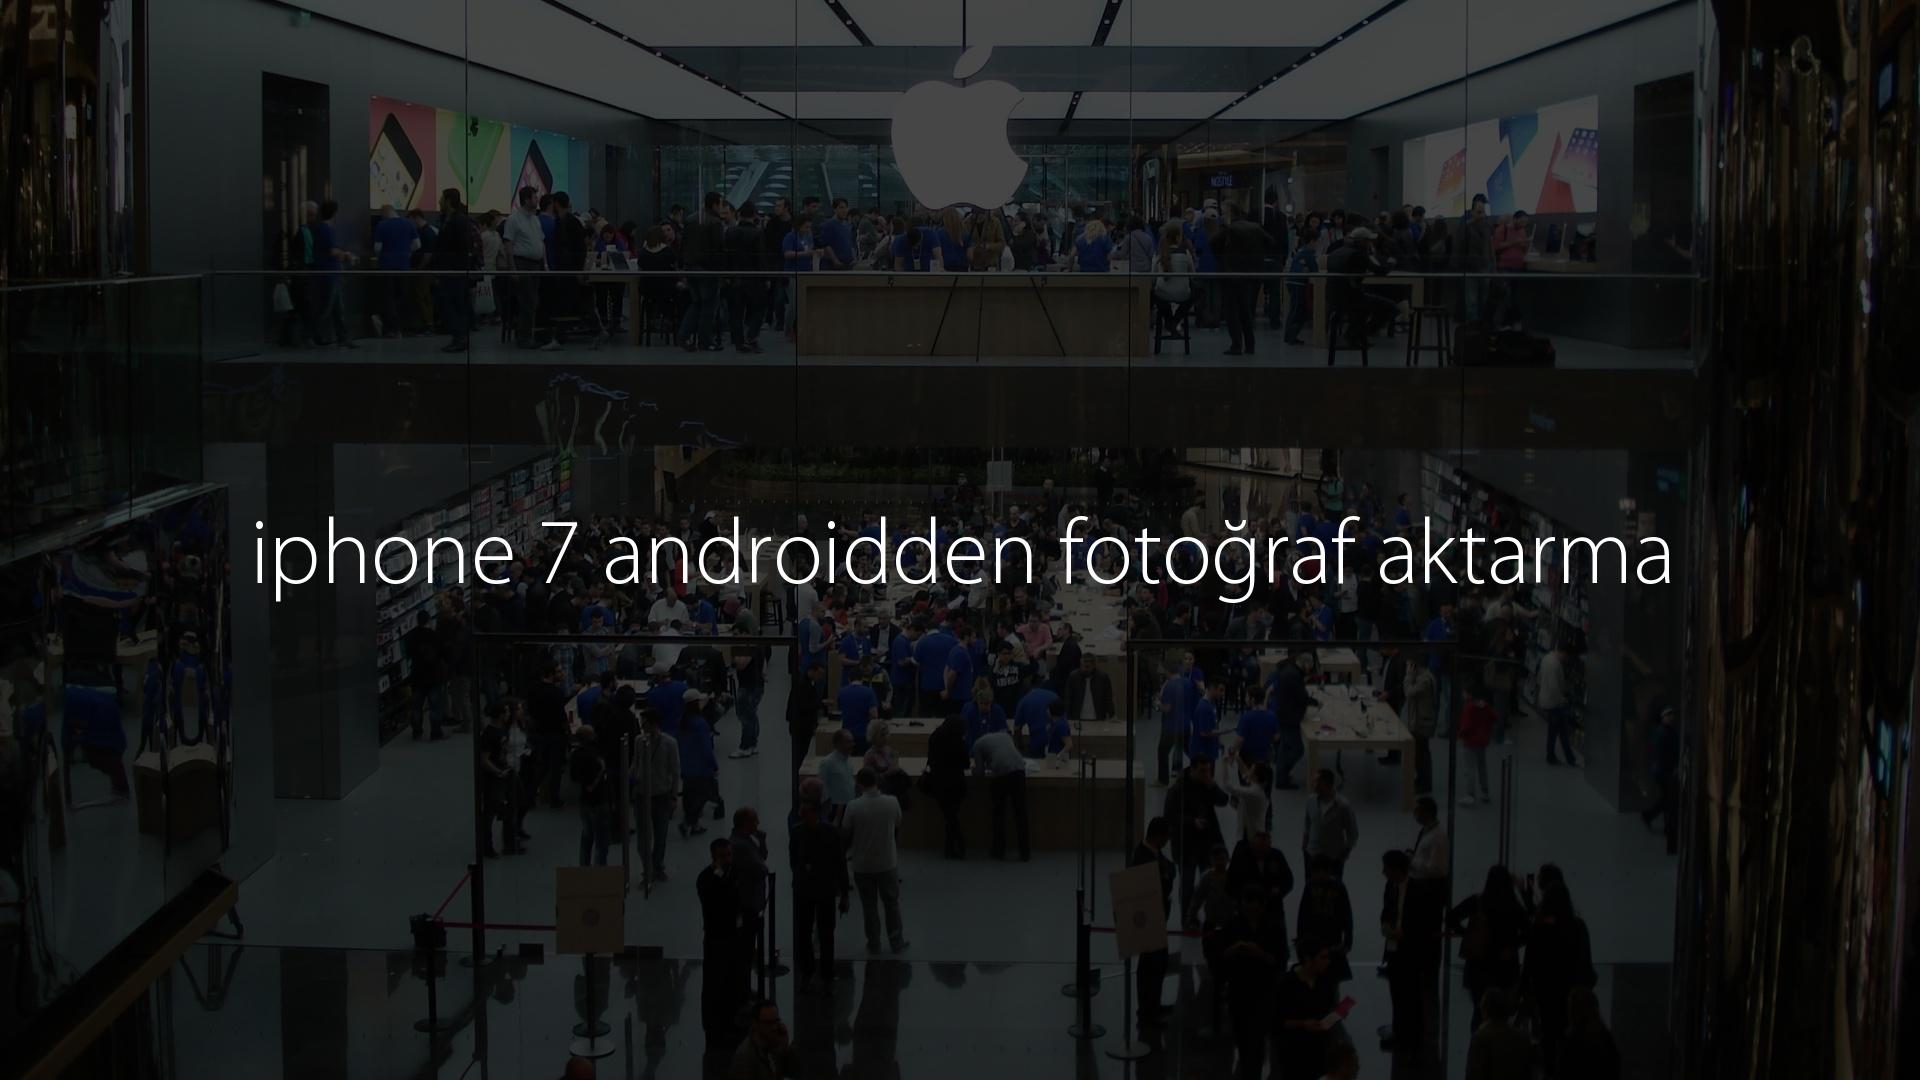 iphone 7 androidden fotoğraf aktarma